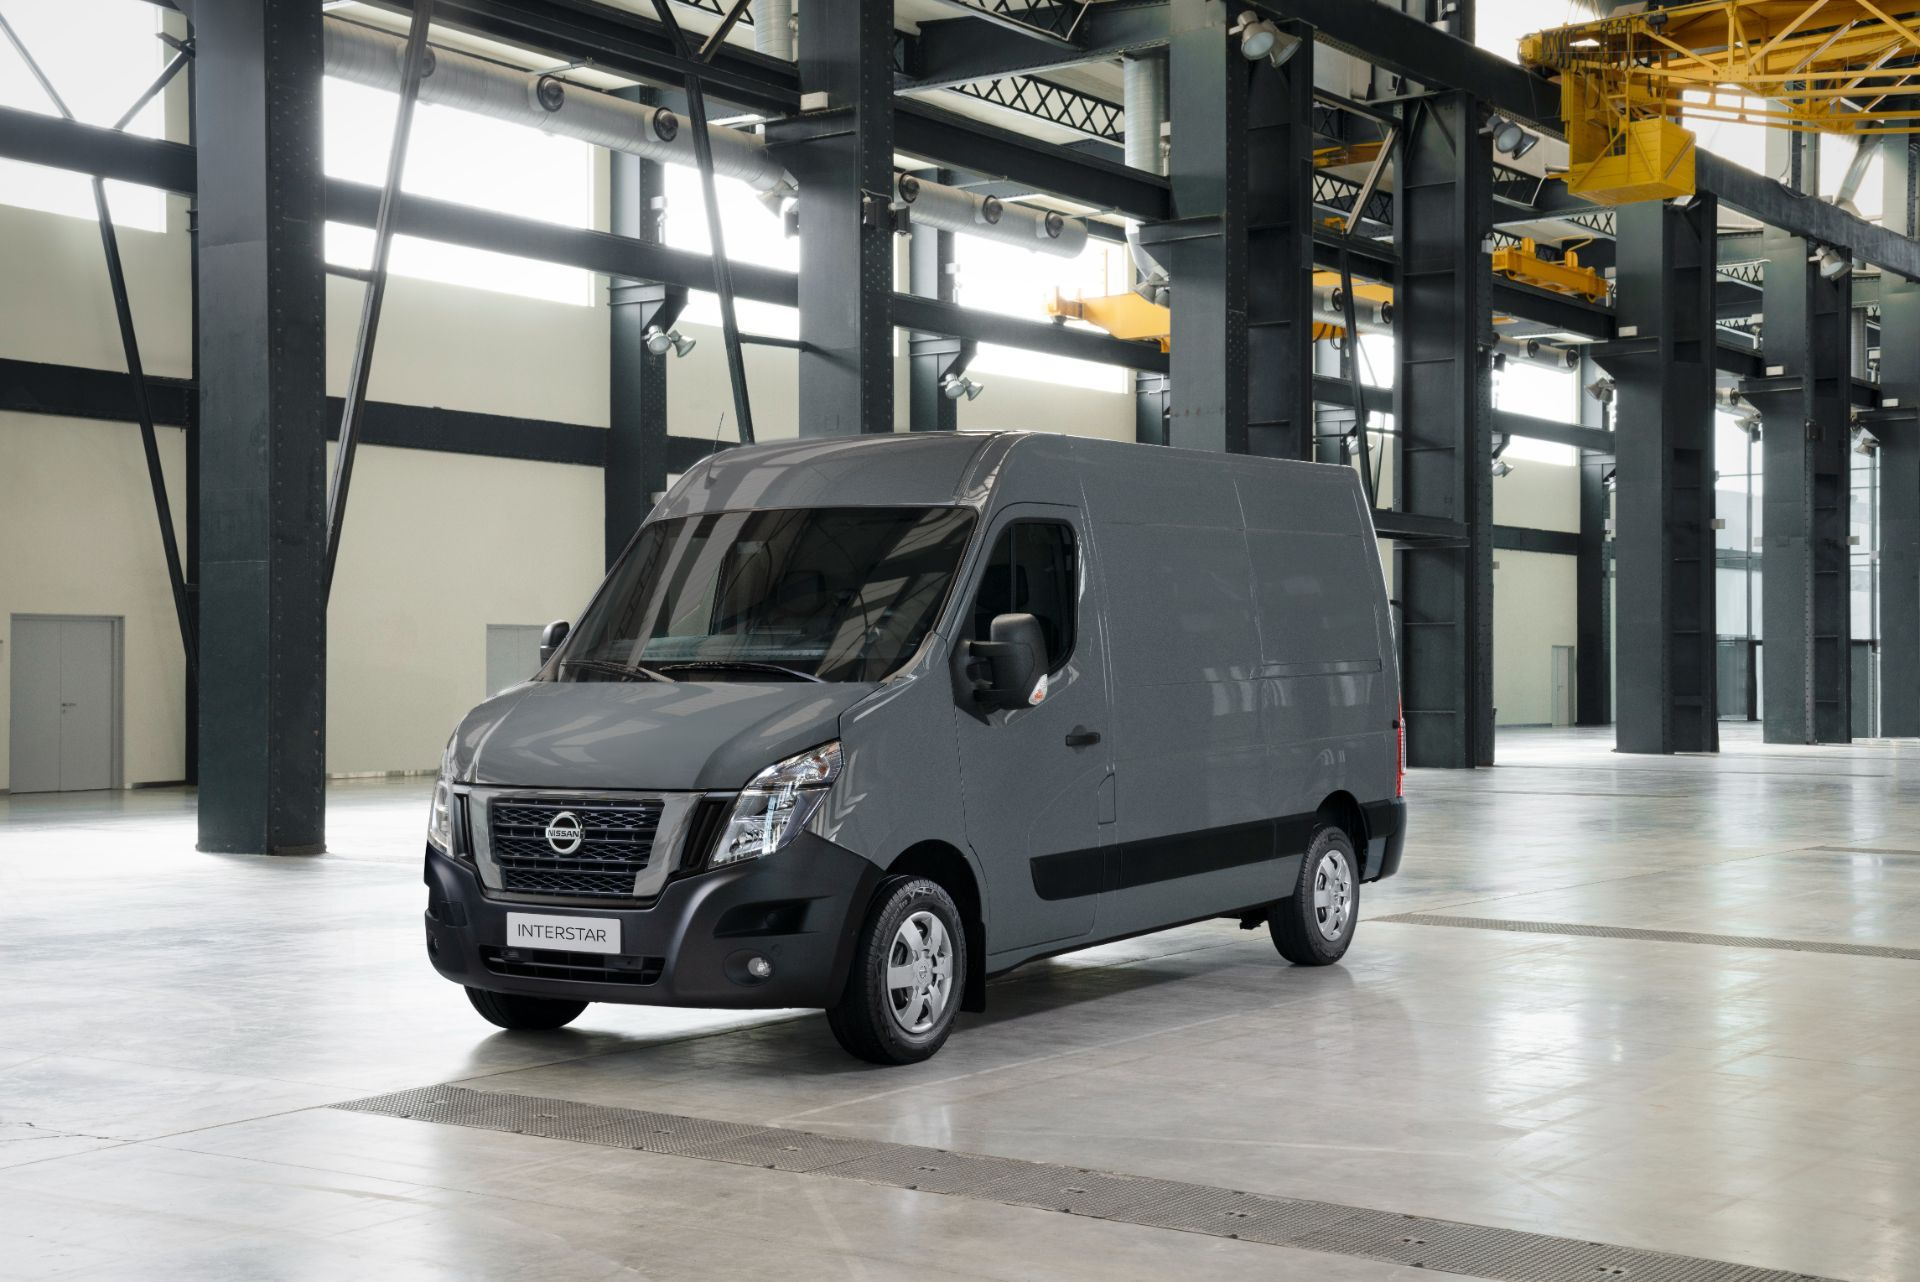 2022-Nissan-Interstar-Van-1